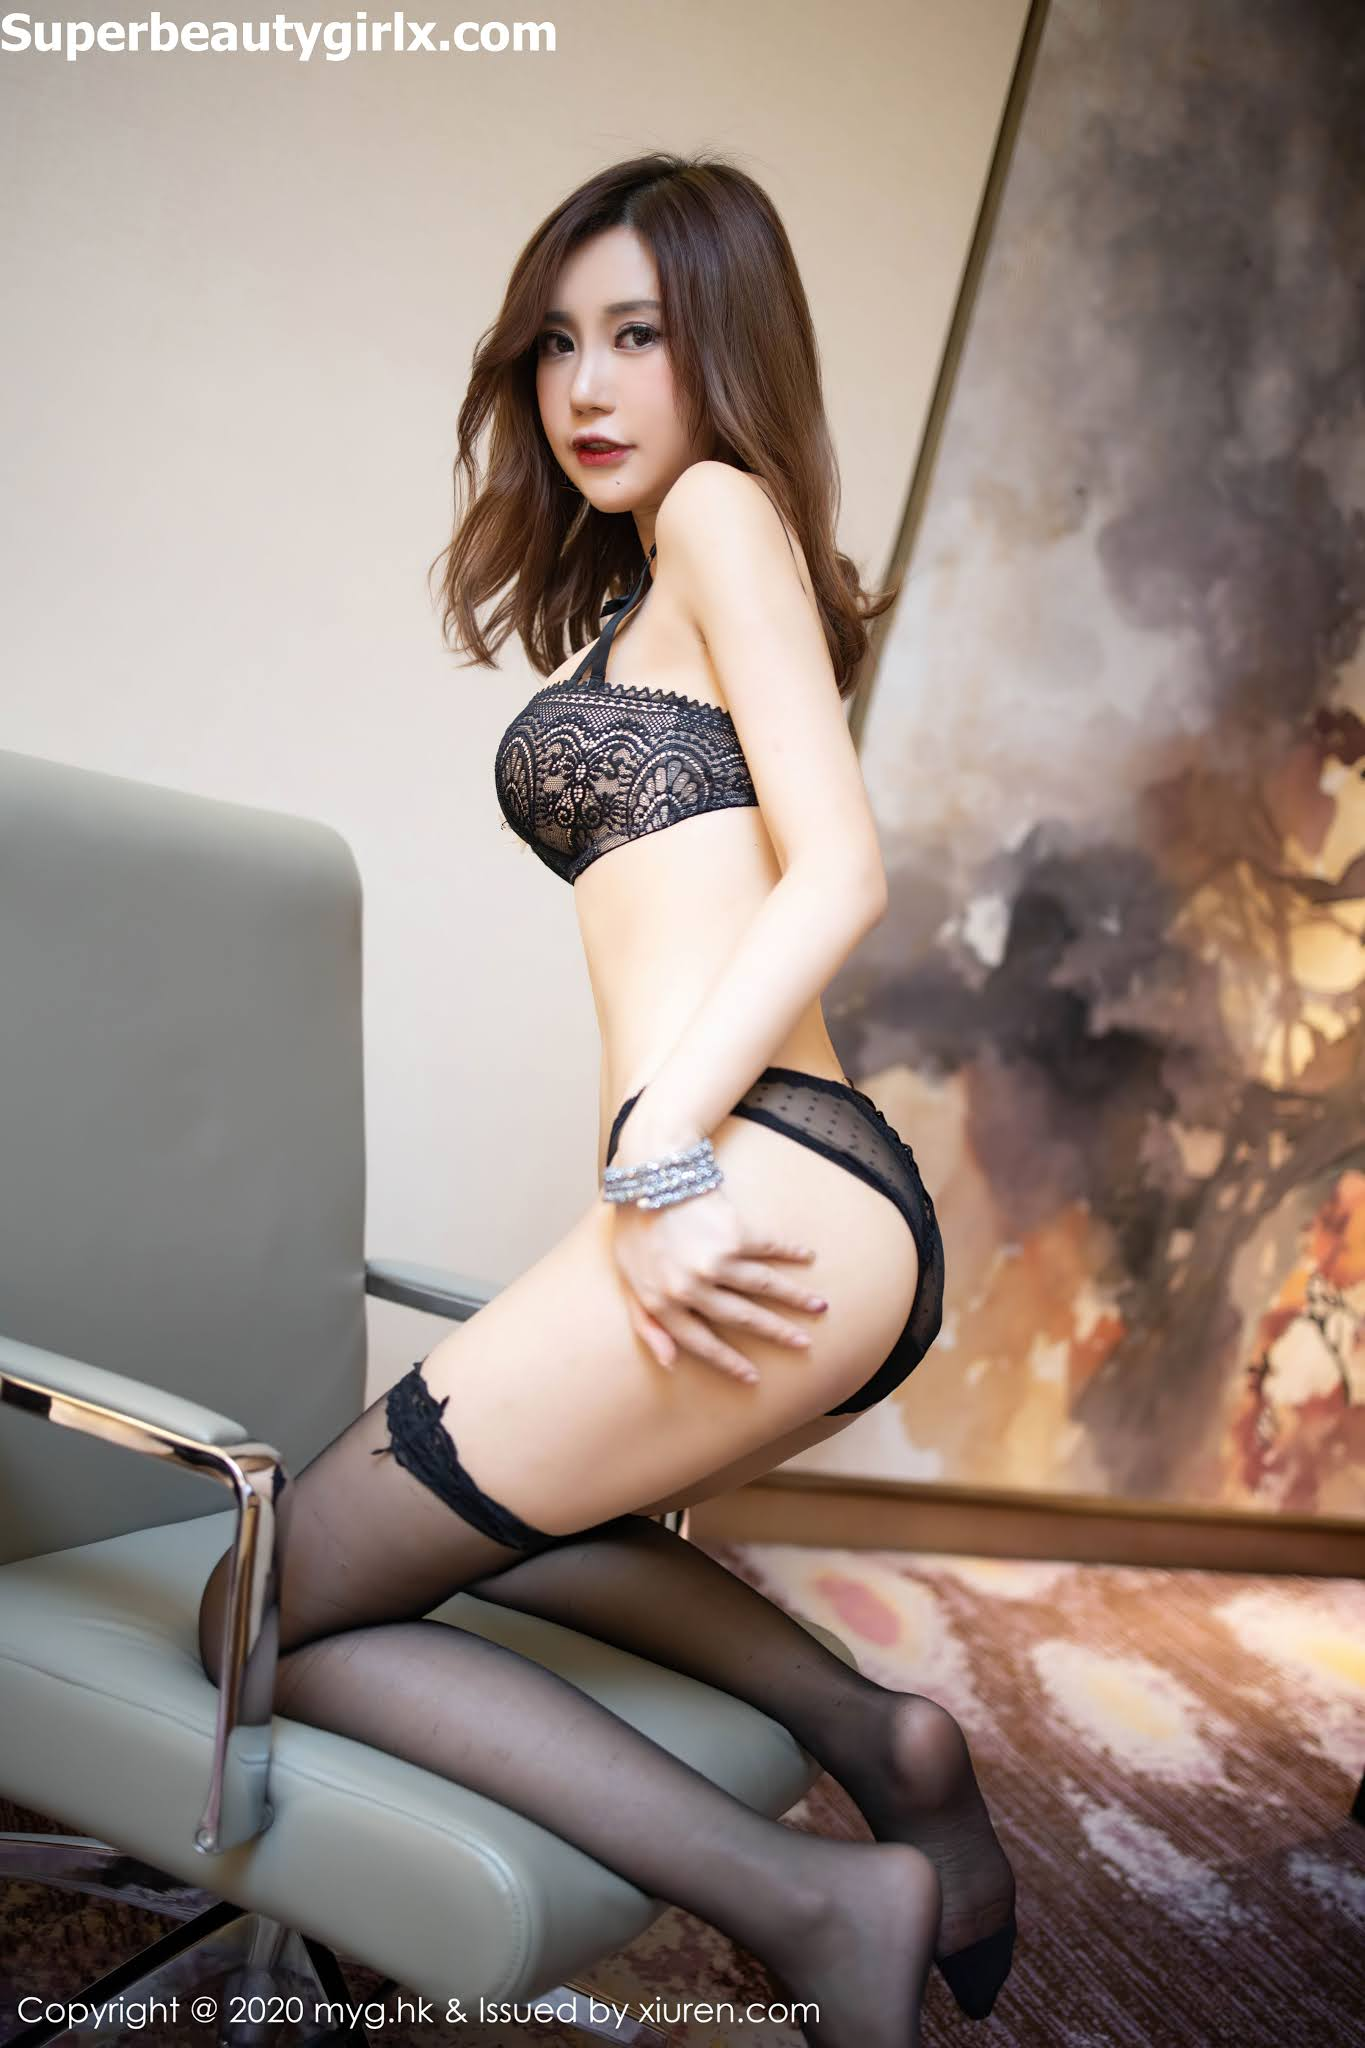 MyGirl-Vol.469-Ula-Qi-Li-Jia-Superbeautygirlx.com